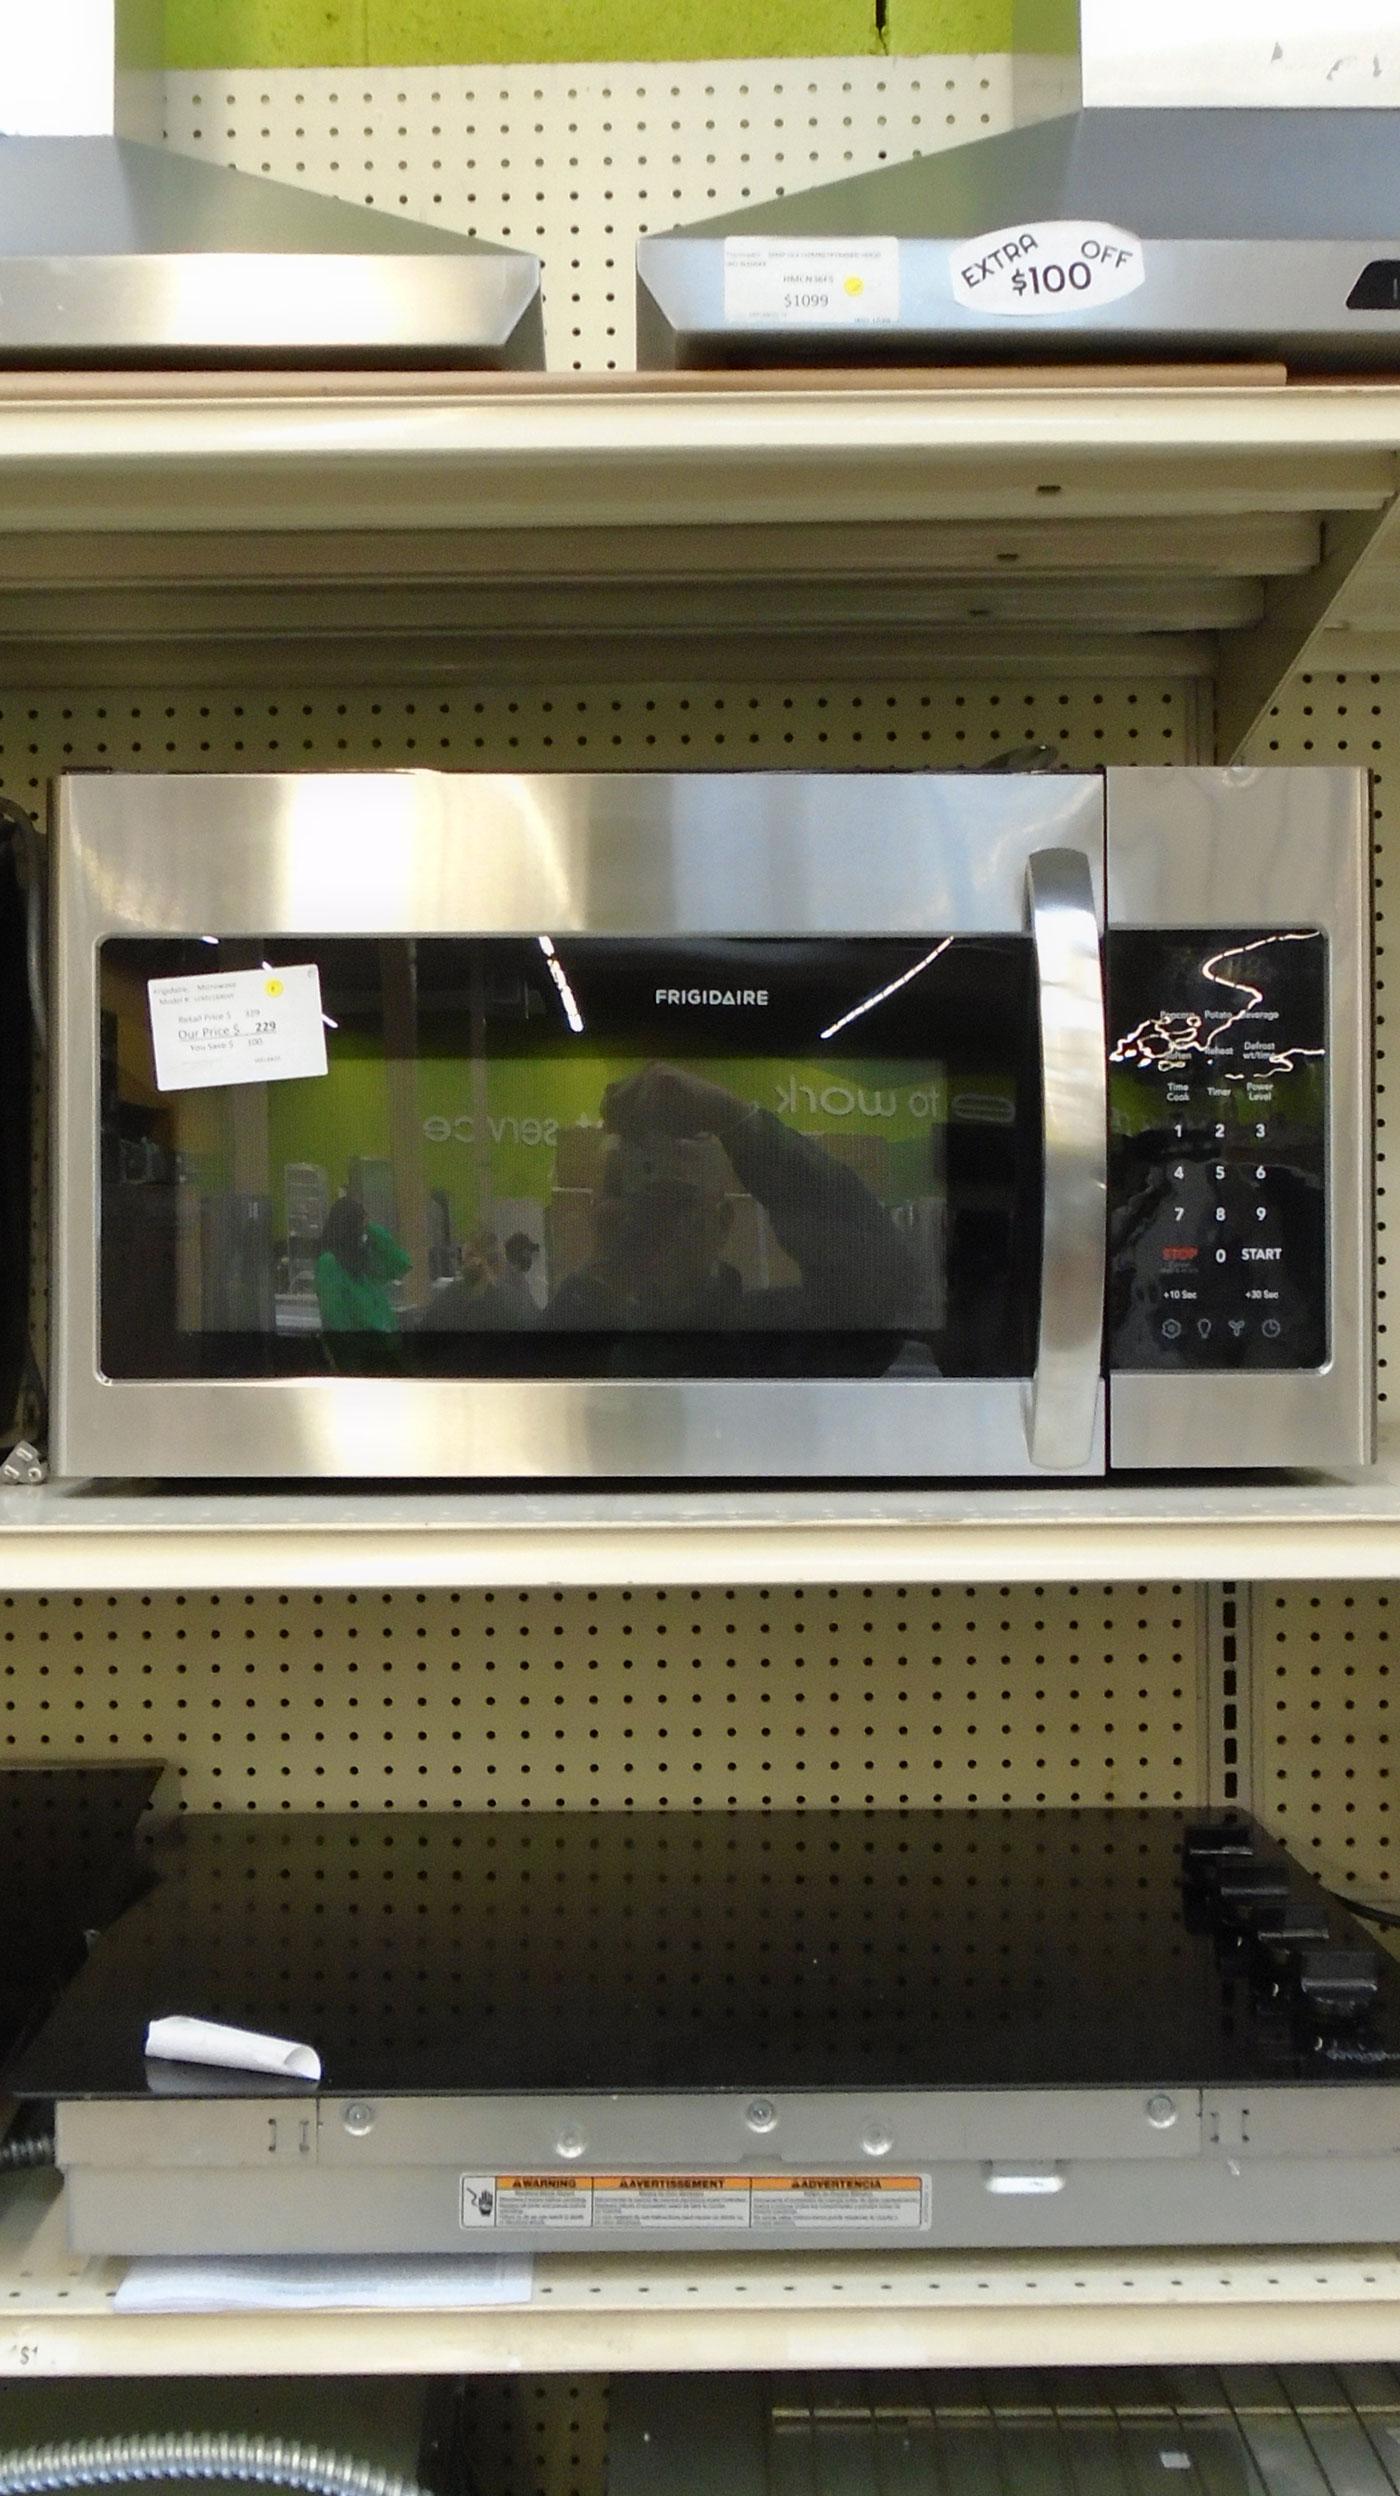 30 frigidaire lfmv1846vf 1 8 cu ft over the range microwave